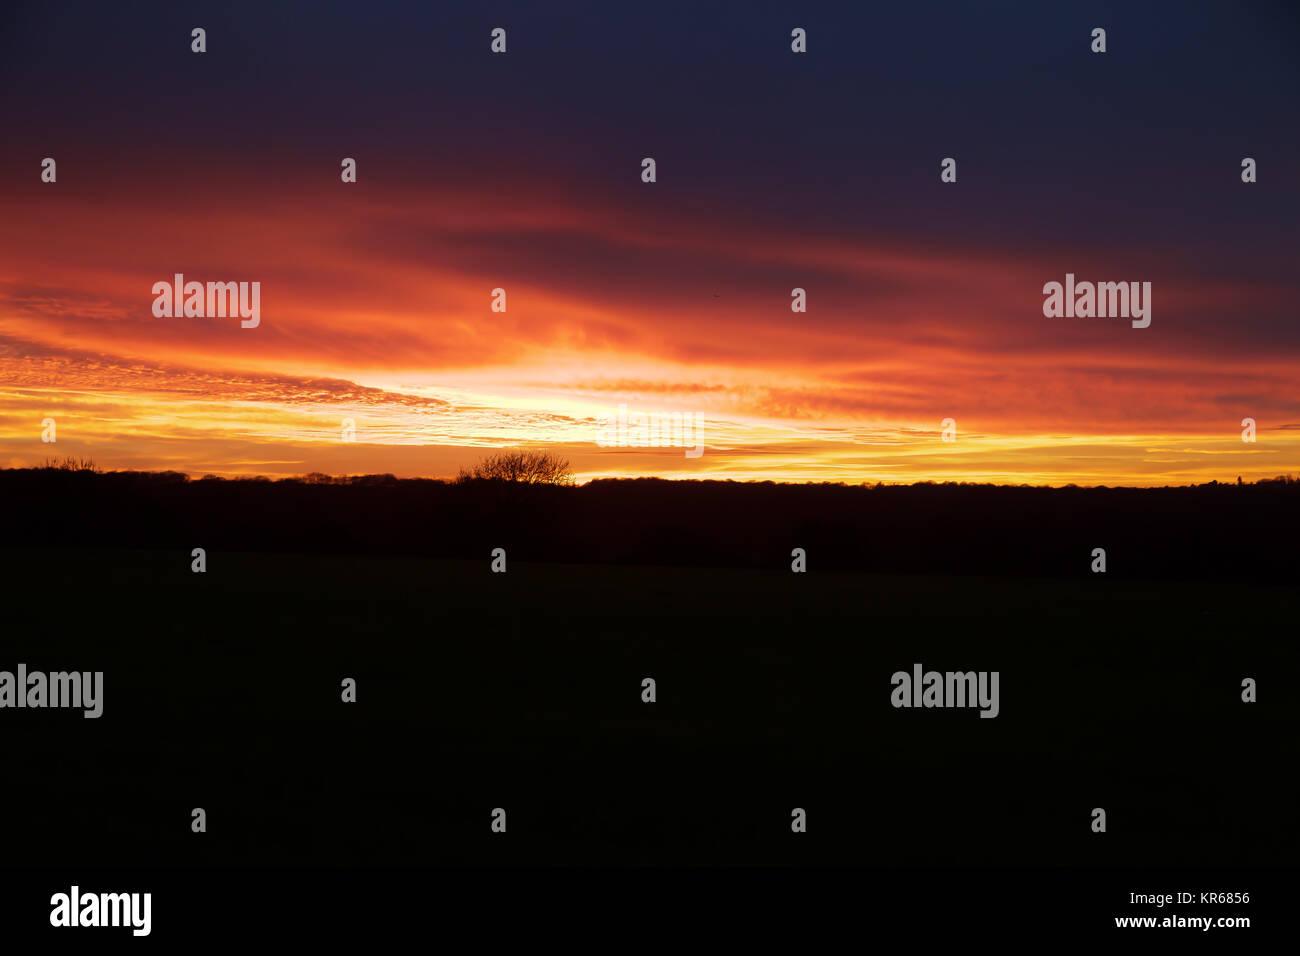 New Addington, UK. 19th Dec, 2017. Red sky over New Addington, Surrey Credit: Keith Larby/Alamy Live News - Stock Image